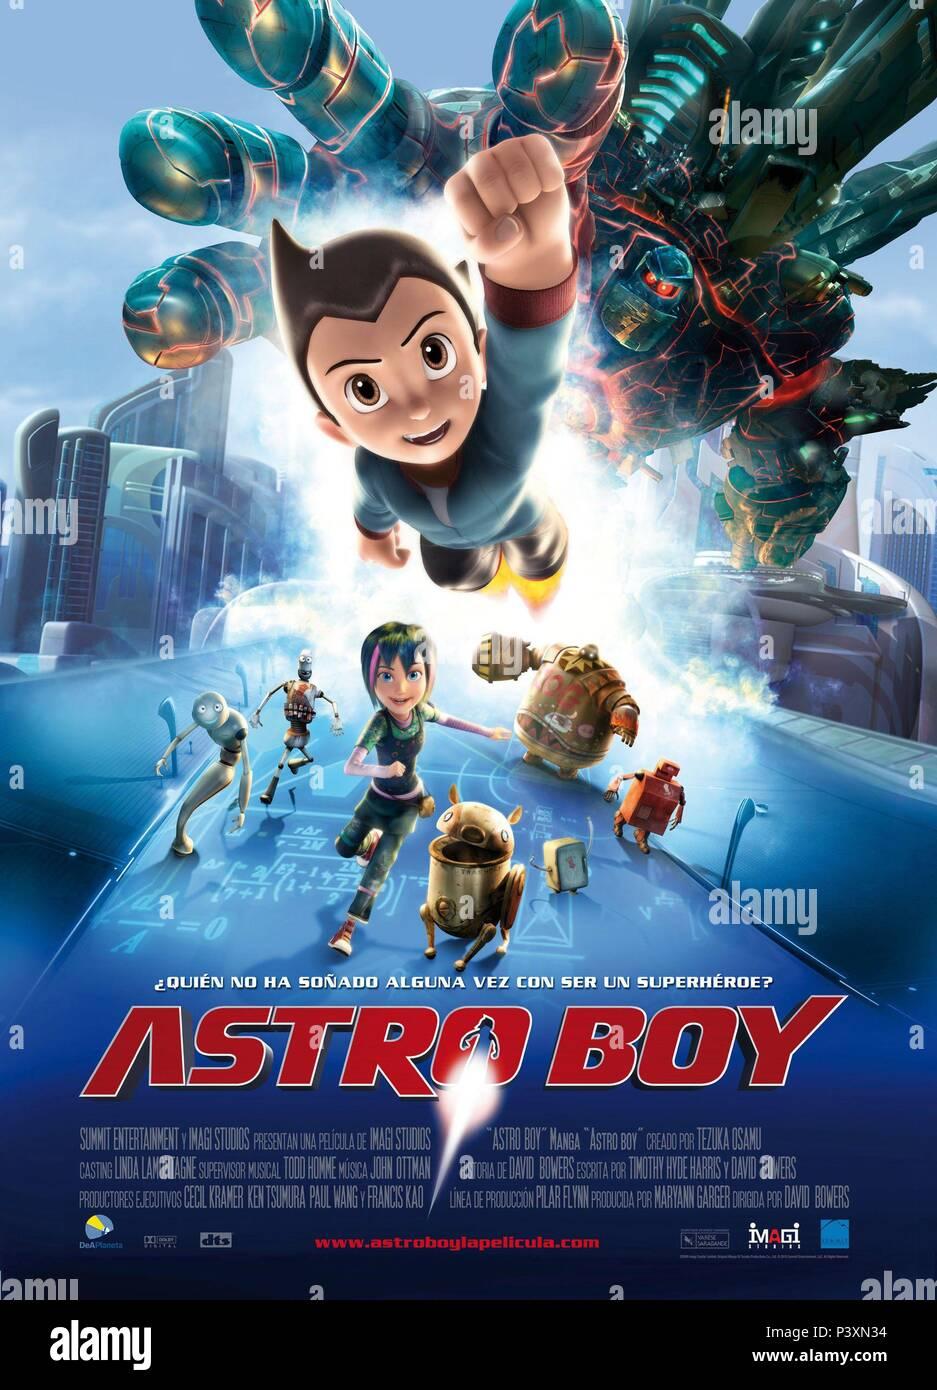 https://c8.alamy.com/comp/P3XN34/original-film-title-astro-boy-english-title-astro-boy-film-director-david-bowers-year-2009-credit-imagi-animation-studiosimagi-crystaltezuka-production-comp-album-P3XN34.jpg